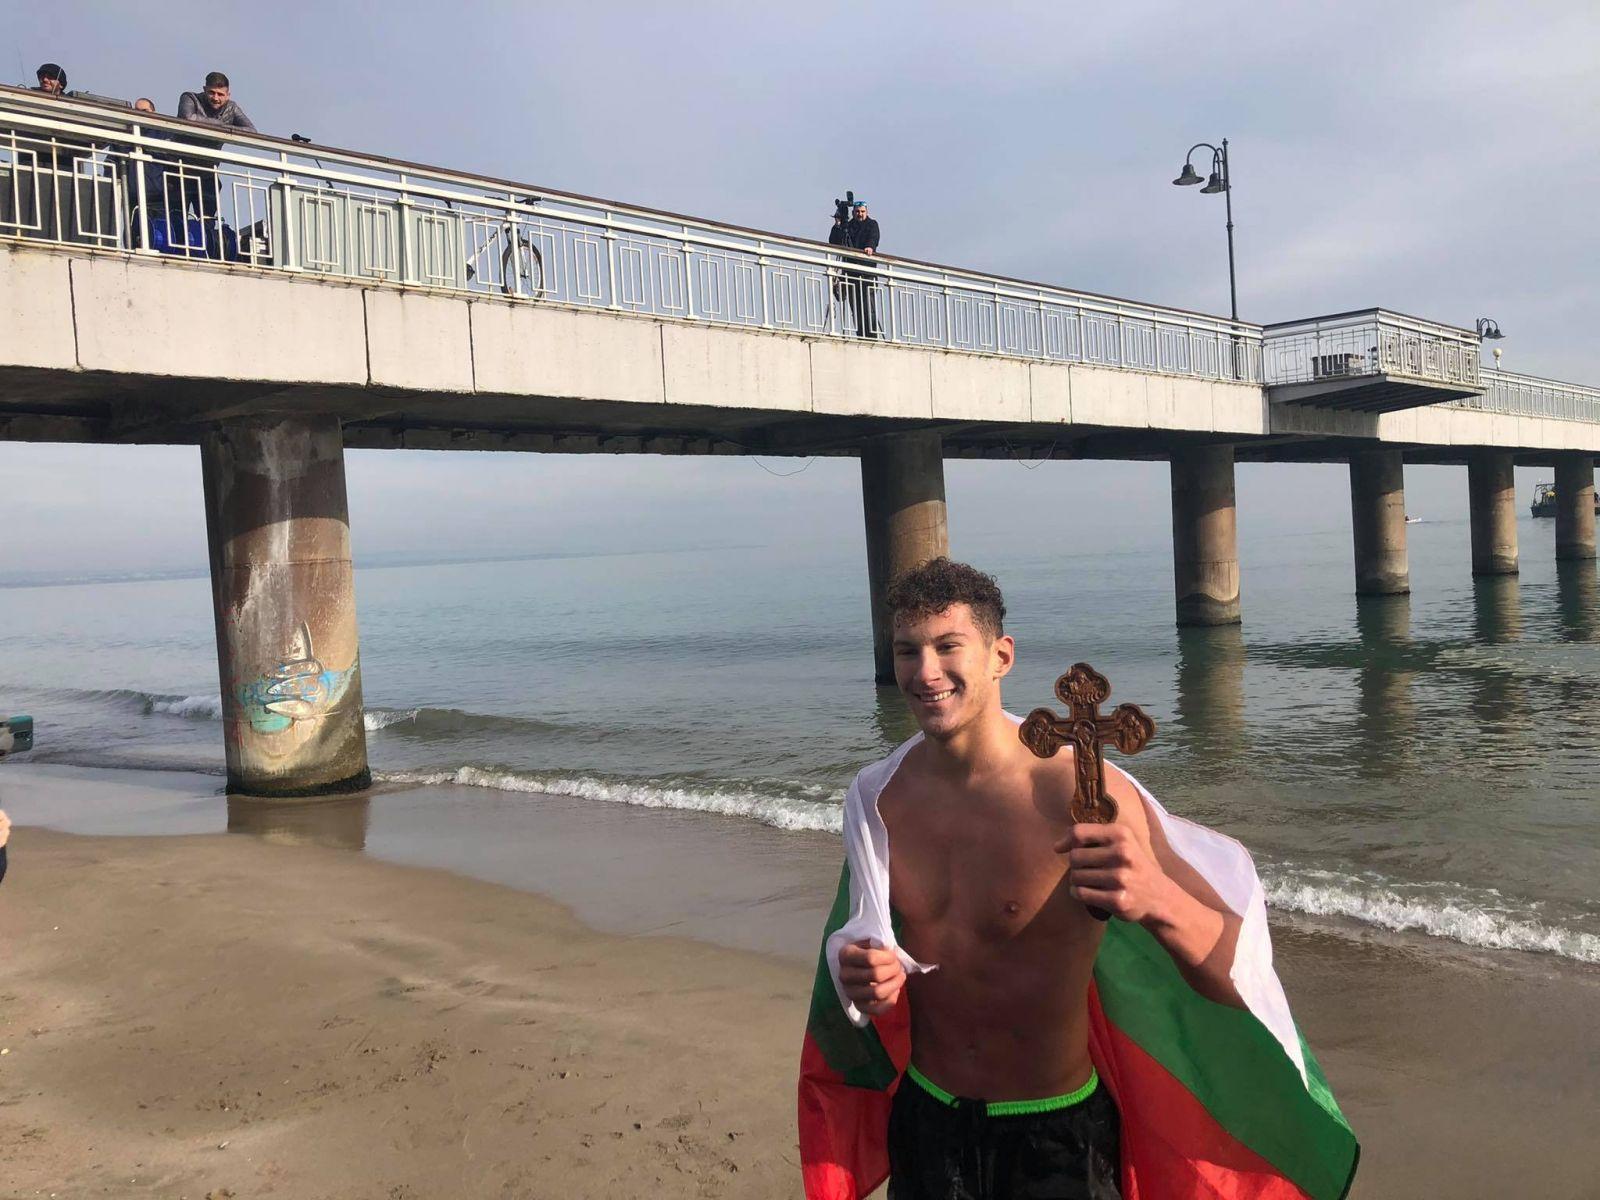 ФОТО-ГАЛЕРИЯ: 18-ГОДИШНИЯТ ИВАН ГАЙТАНОВ СПАСИ СВЕТИЯ КРЪСТ В БУРГАС